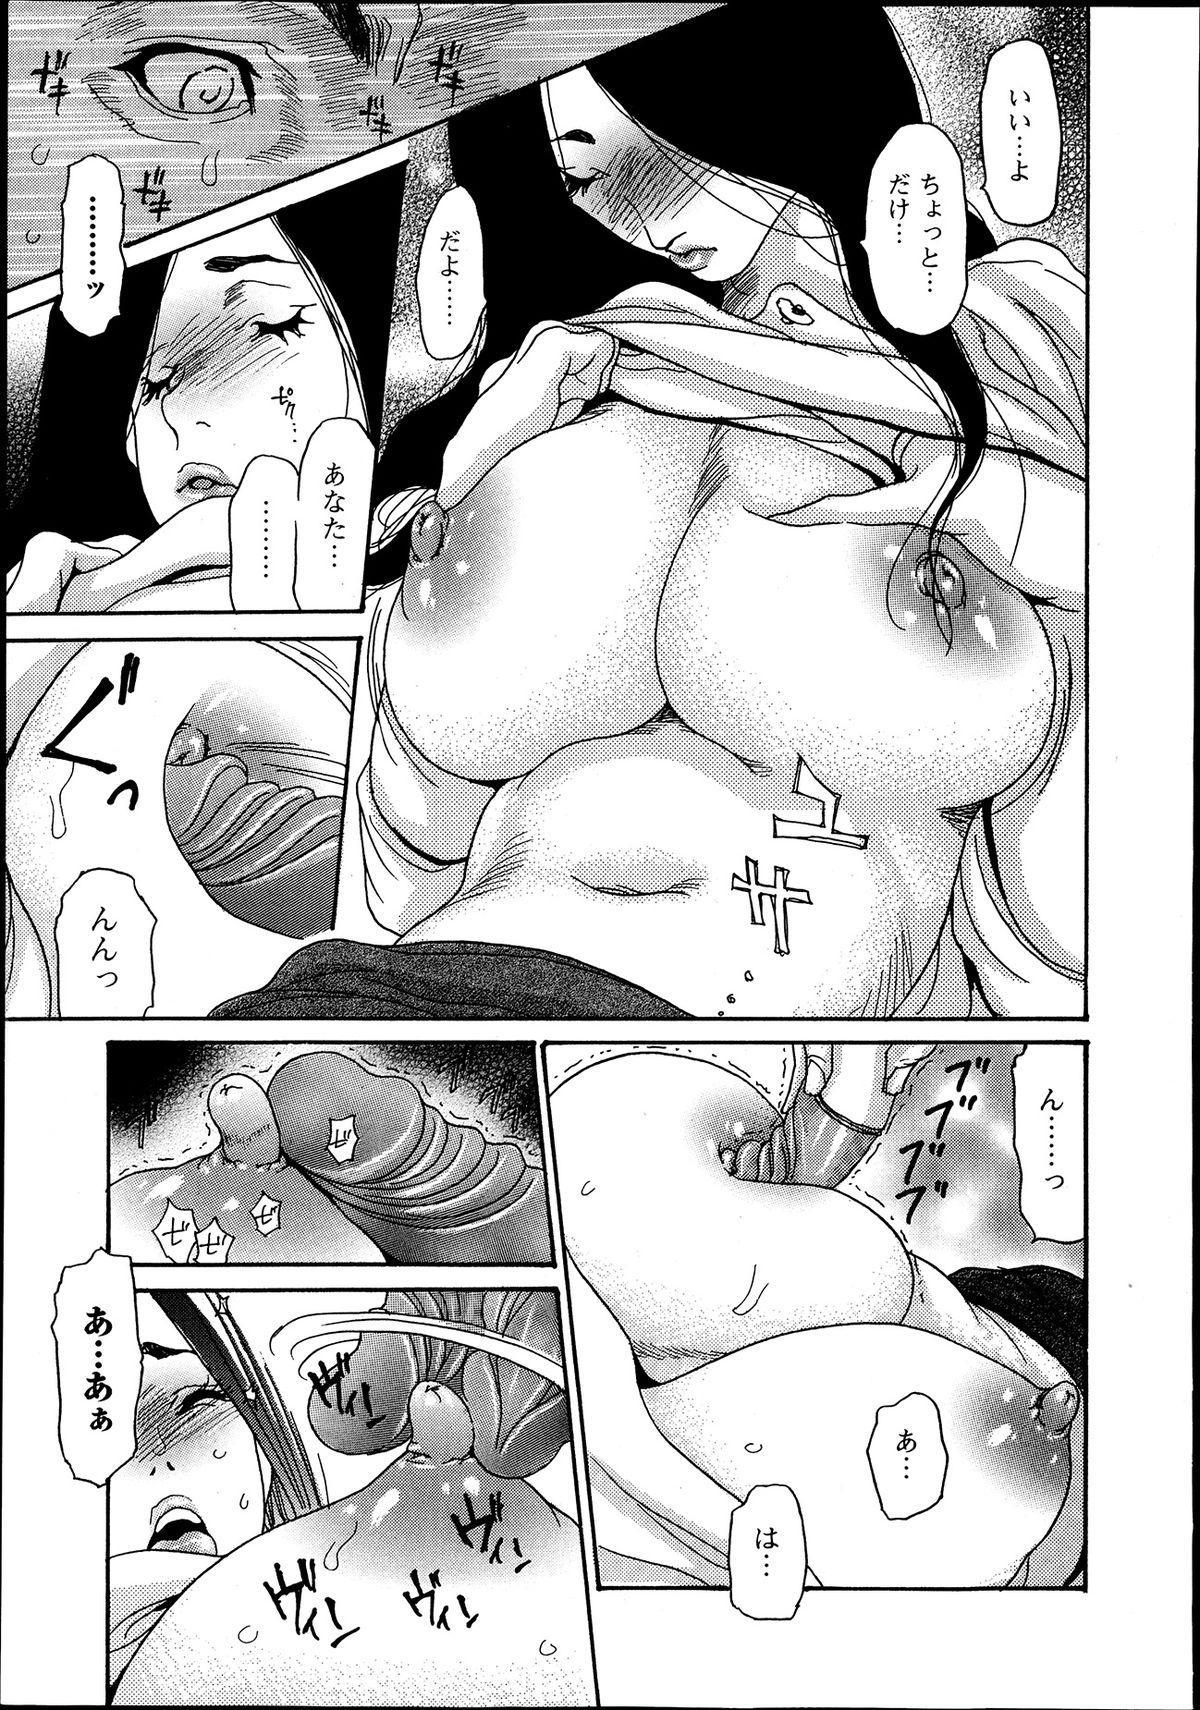 Bishoujo Kakumei KIWAME Road Vol.9 238